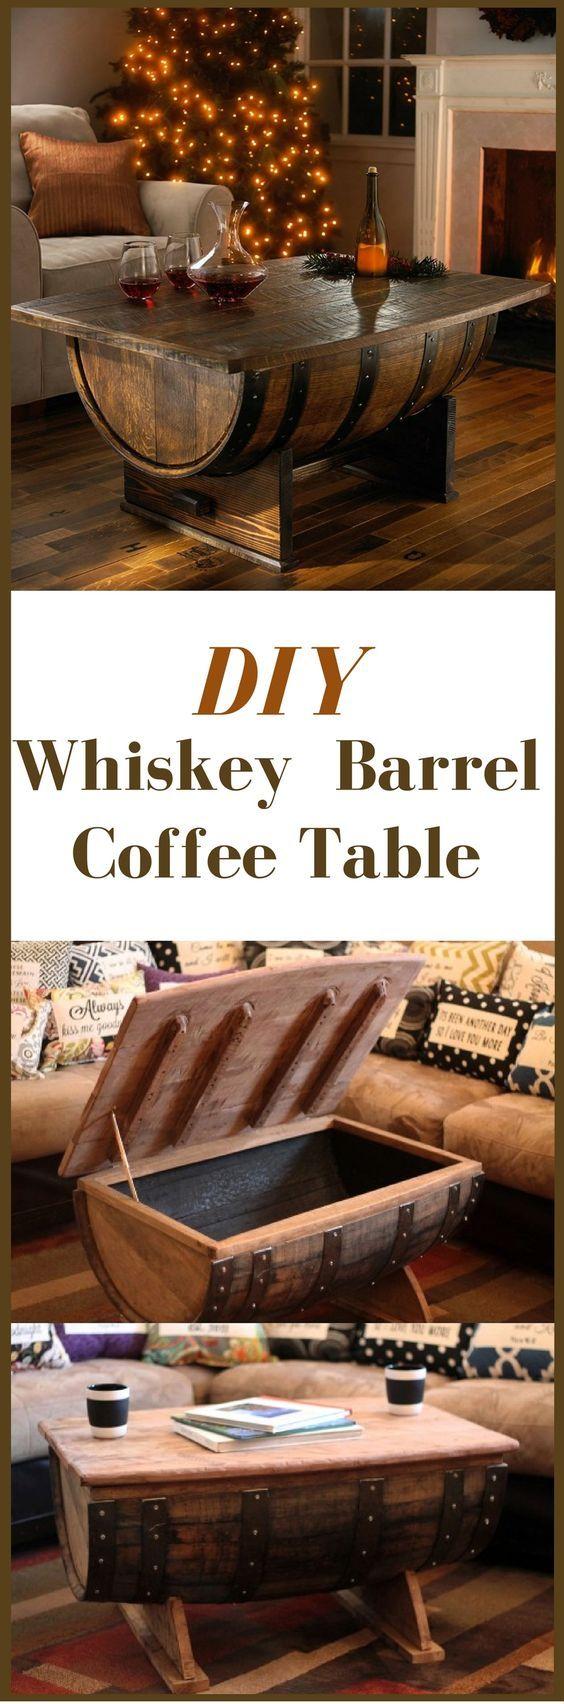 http://www.diypete.com/build-whiskey-barrel-coffee-table/ https://www.youtube.com/watch?v=I7w5810fG1k